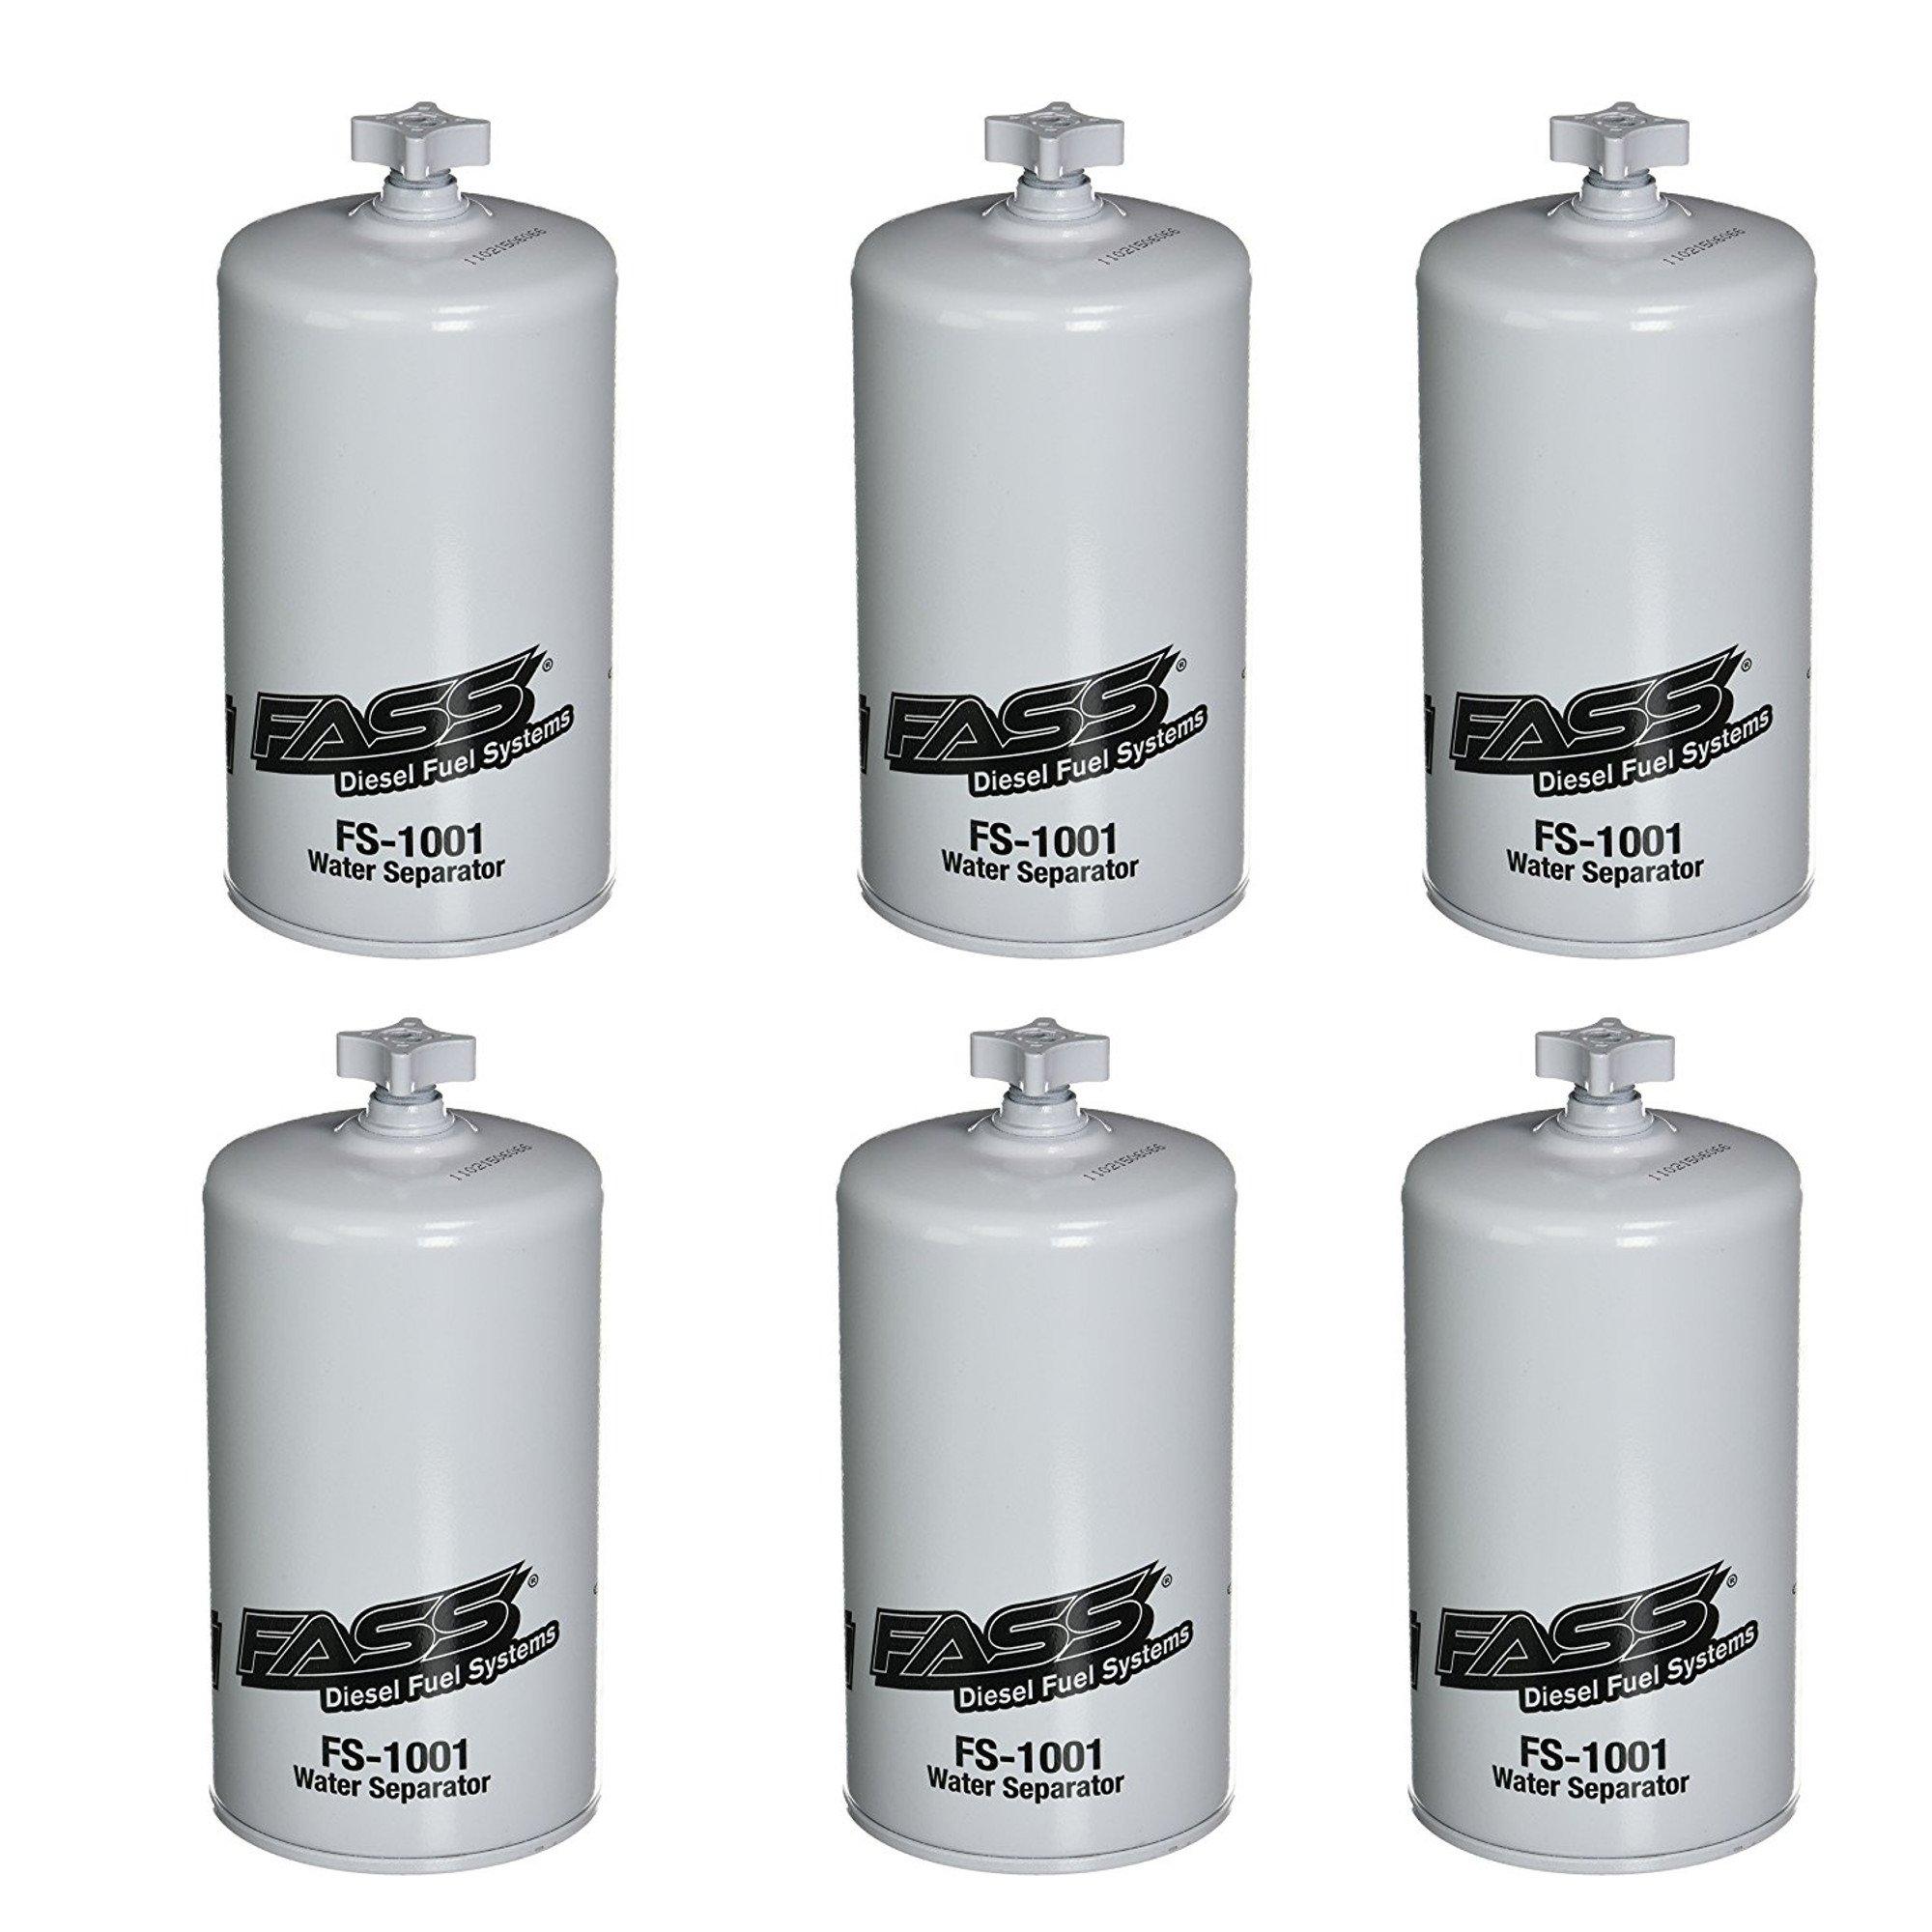 FASS FS-1001 (Lot of 6) Titanium Series Water Separator Fuel Pump HD Water Separator For FASS Fuel System